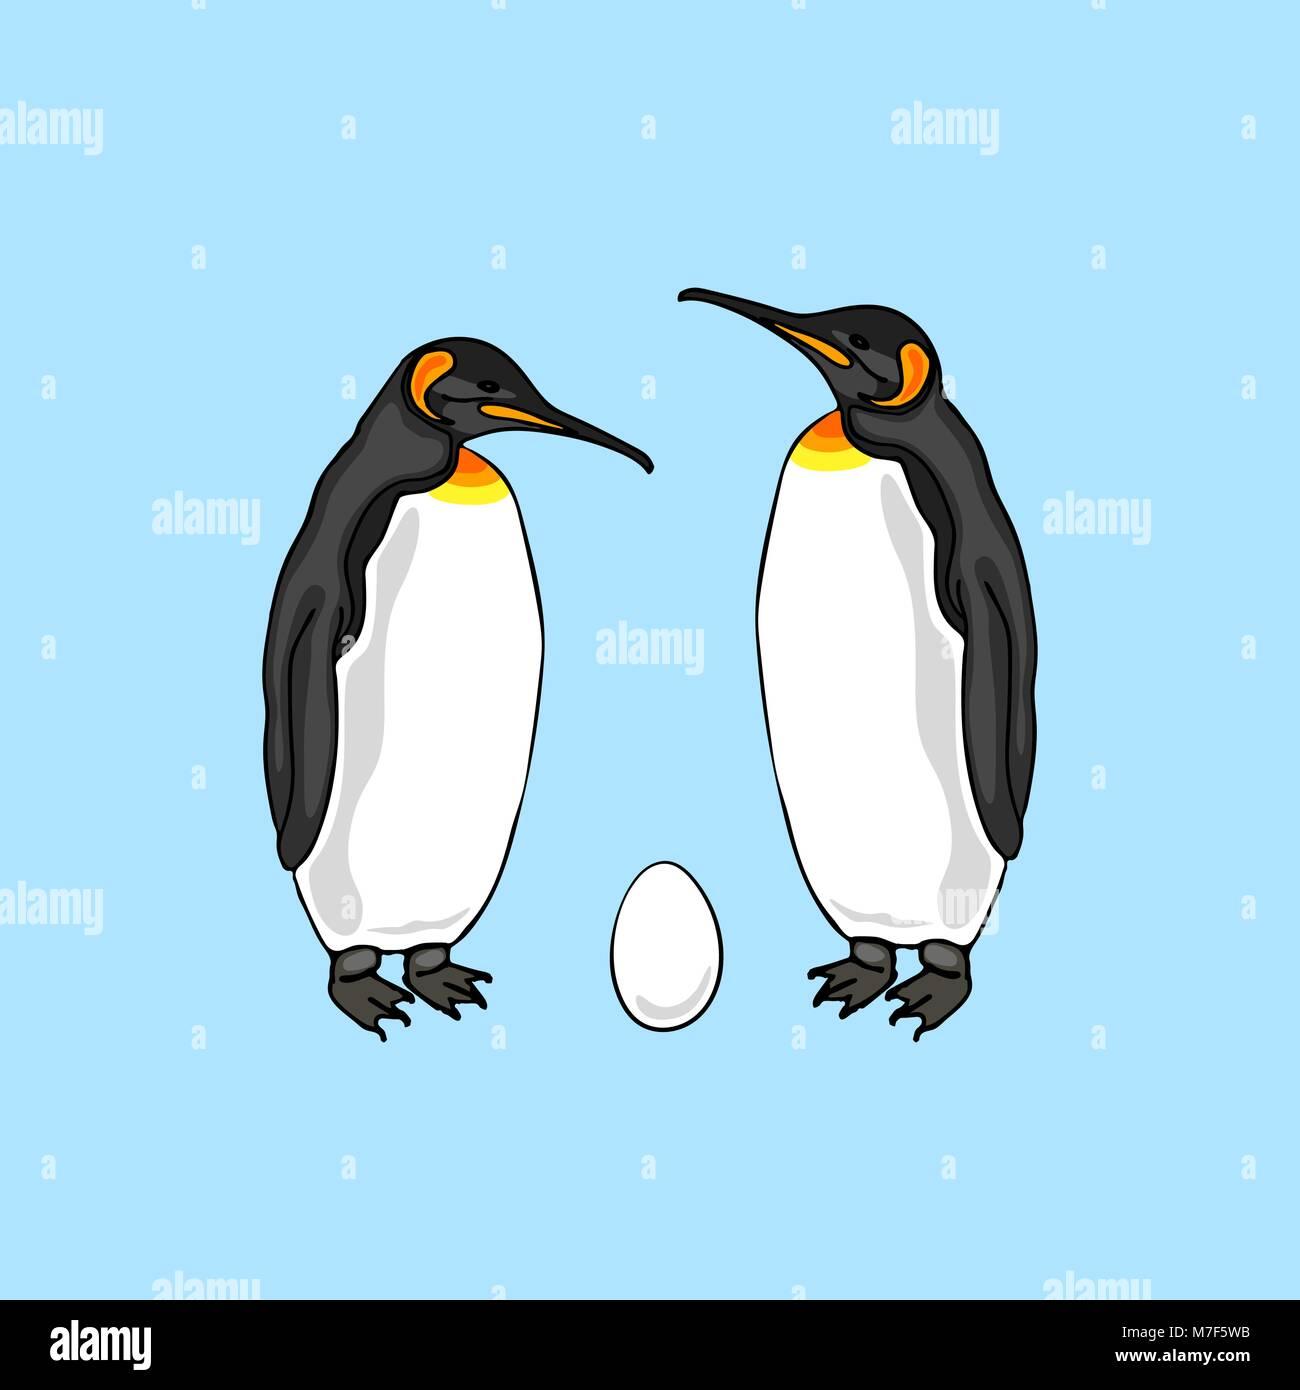 Vector illustration of bird penguin couple with egg. Emperor penguin family - Stock Image